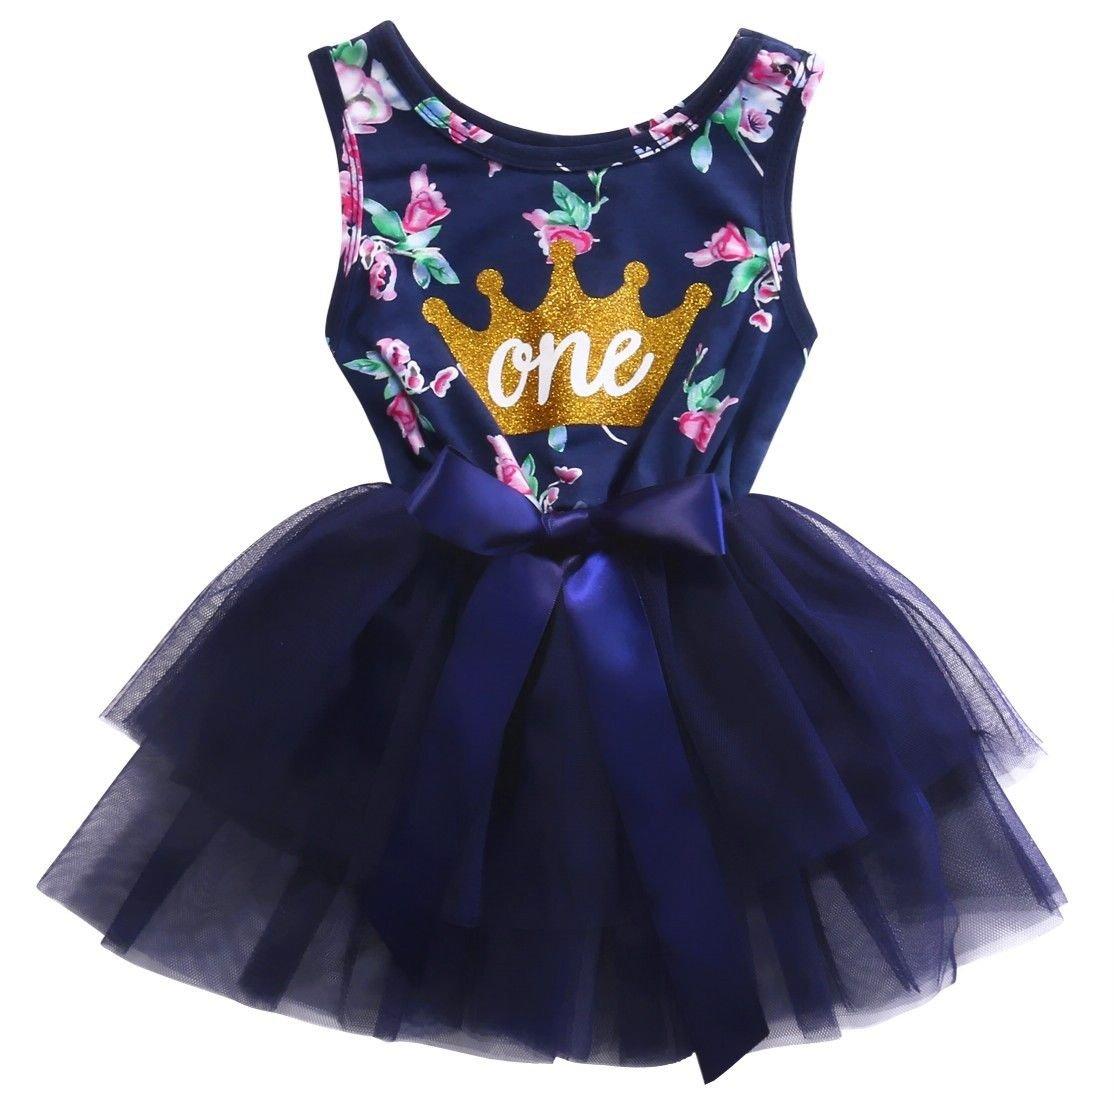 0-2T Kid Girls Princess Baby Dress Newborn Infant Baby Girl